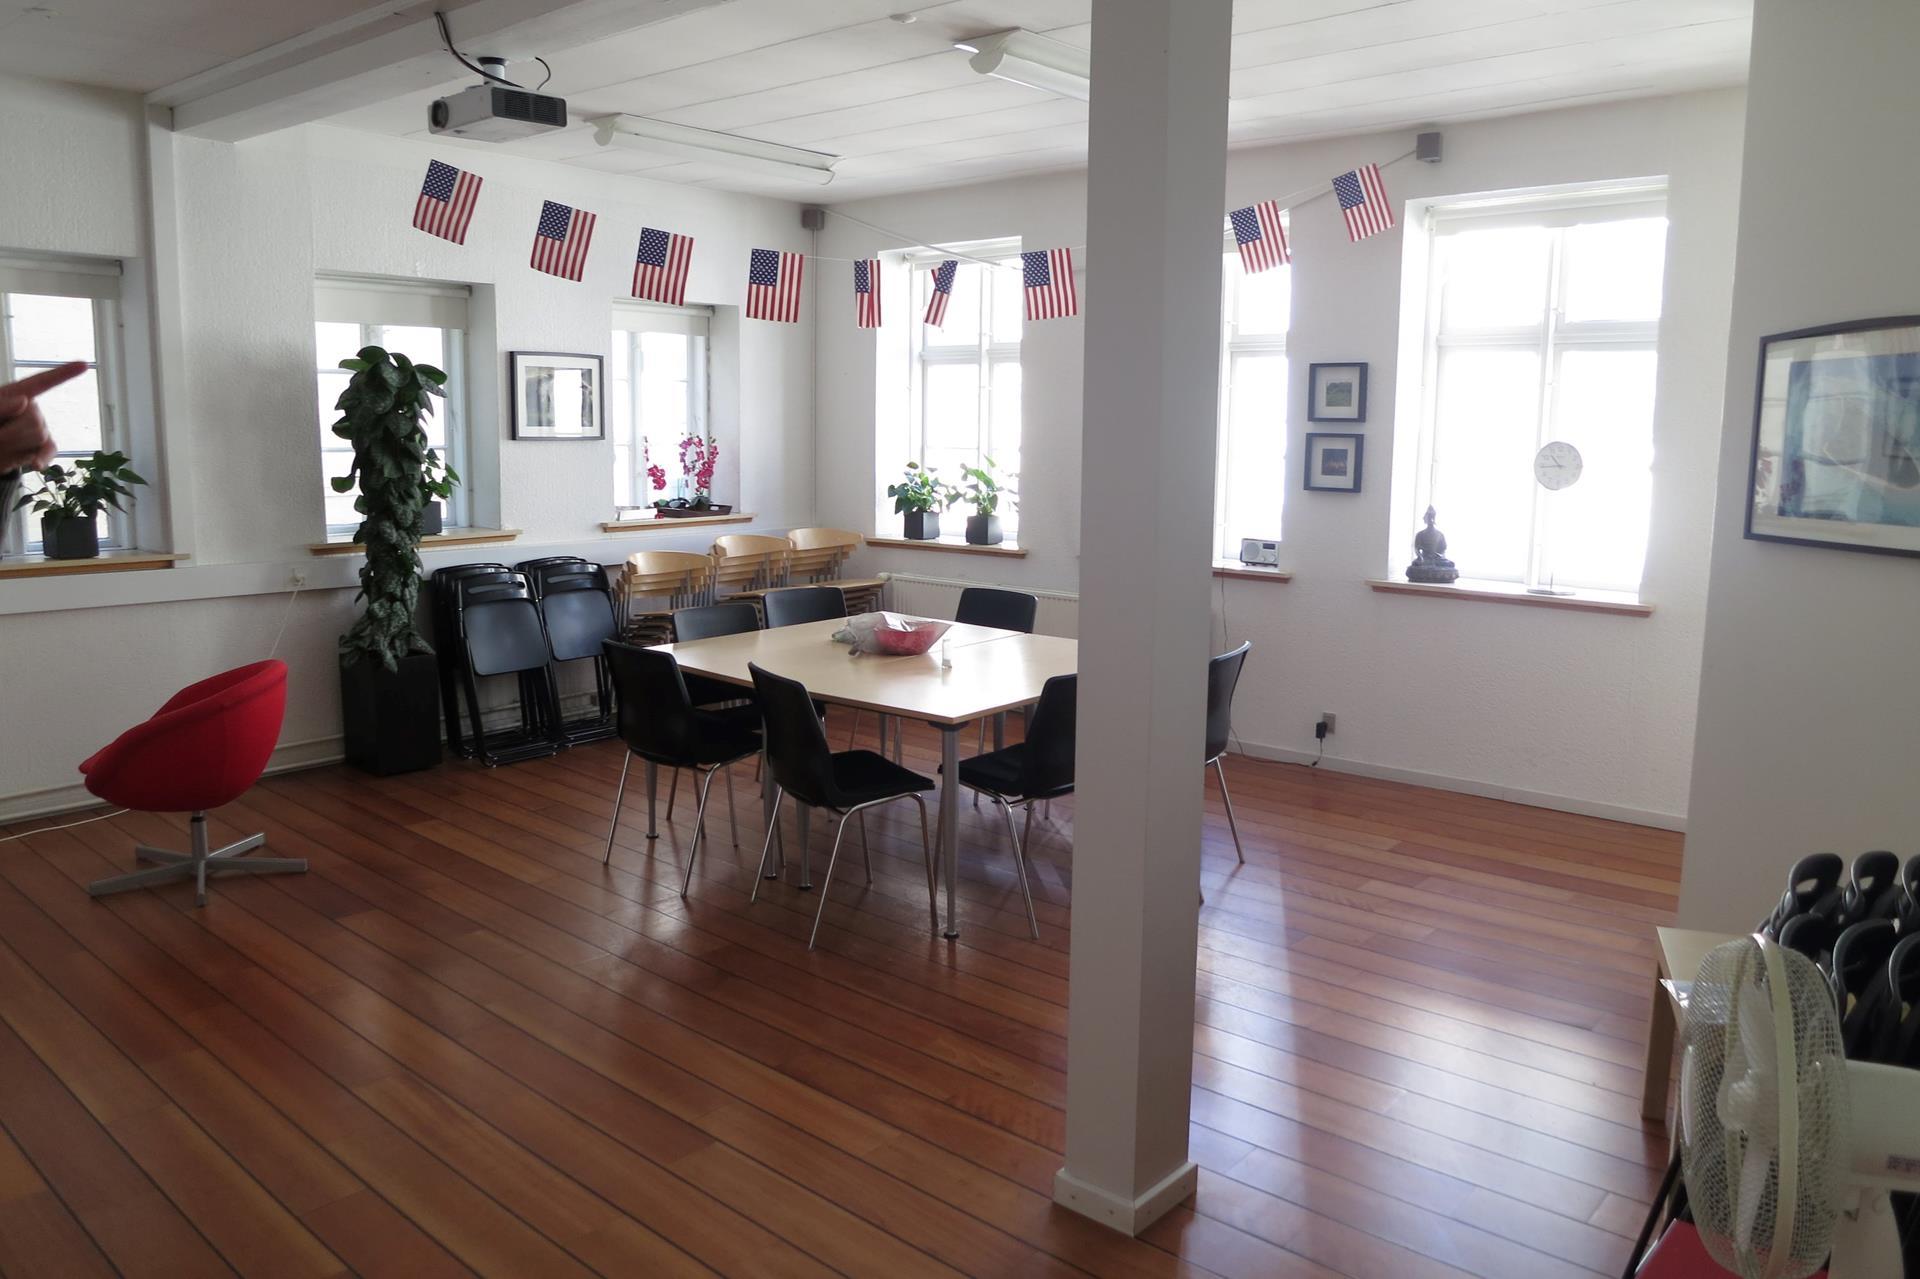 Bolig/erhverv på Vesterå i Aalborg - Andet